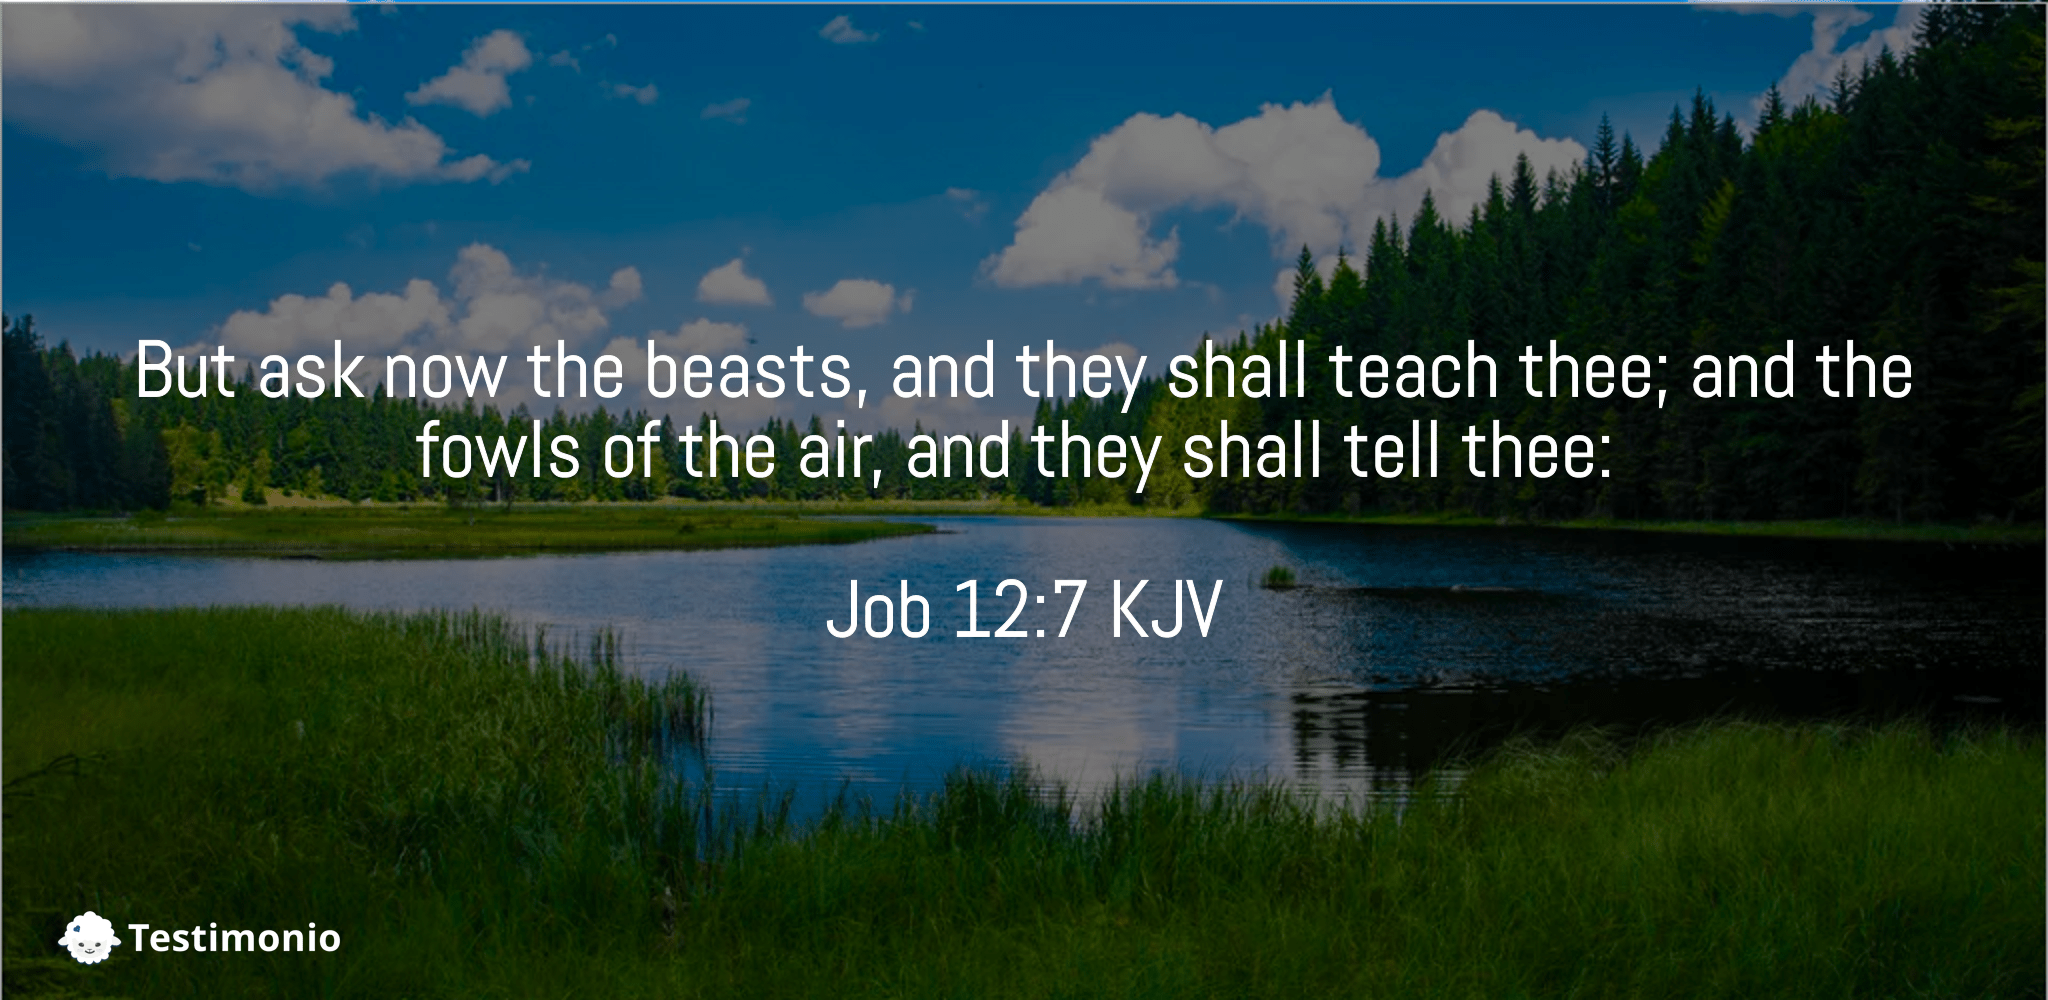 Job 12:7